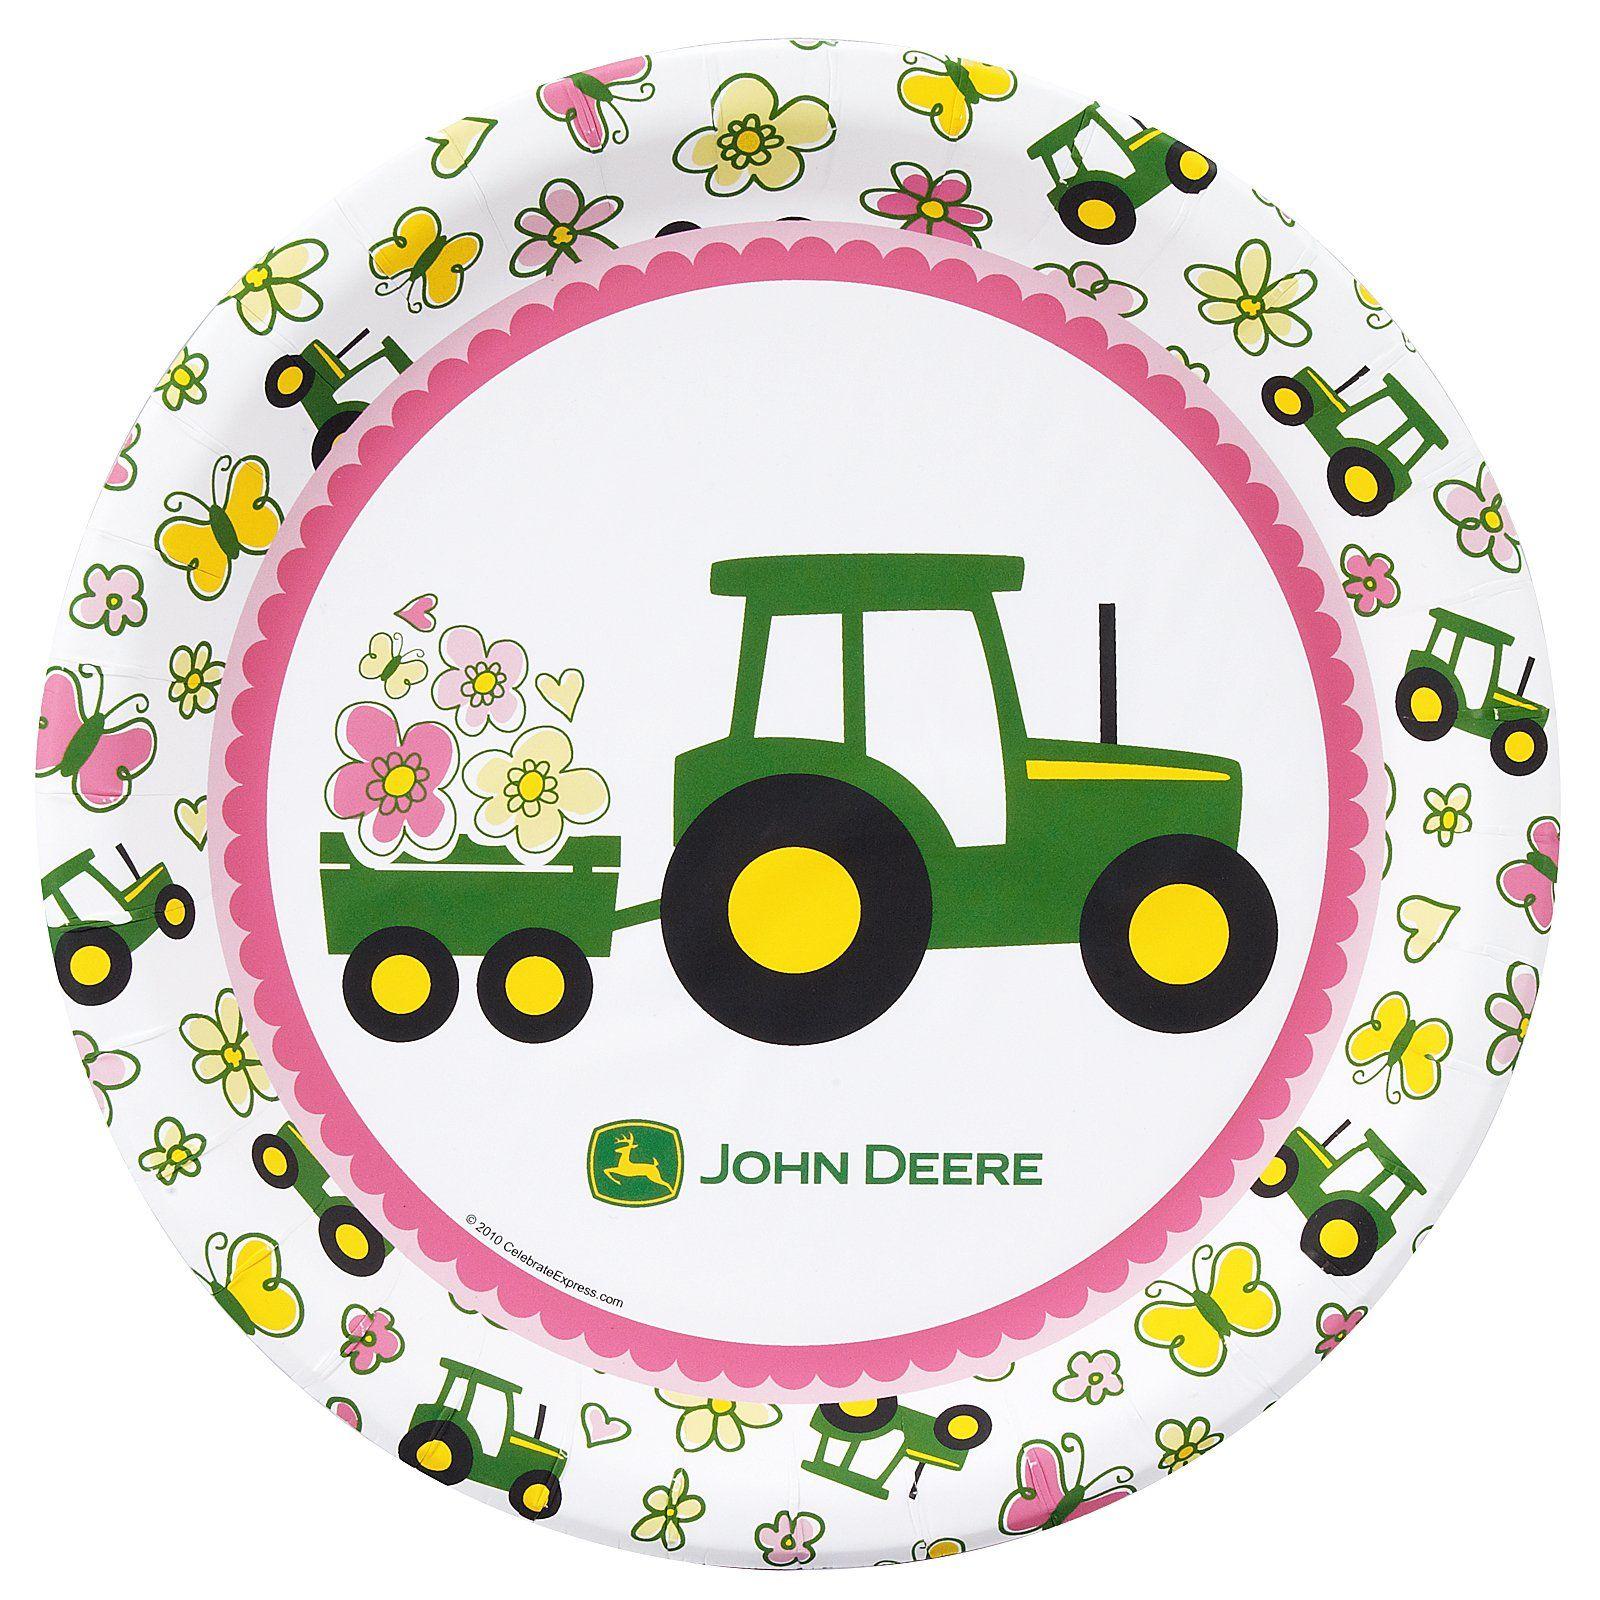 John Deere Pink Dinner Plates  sc 1 st  Pinterest & John Deere Pink Dinner Plates | Pink dinner plates John deere party ...